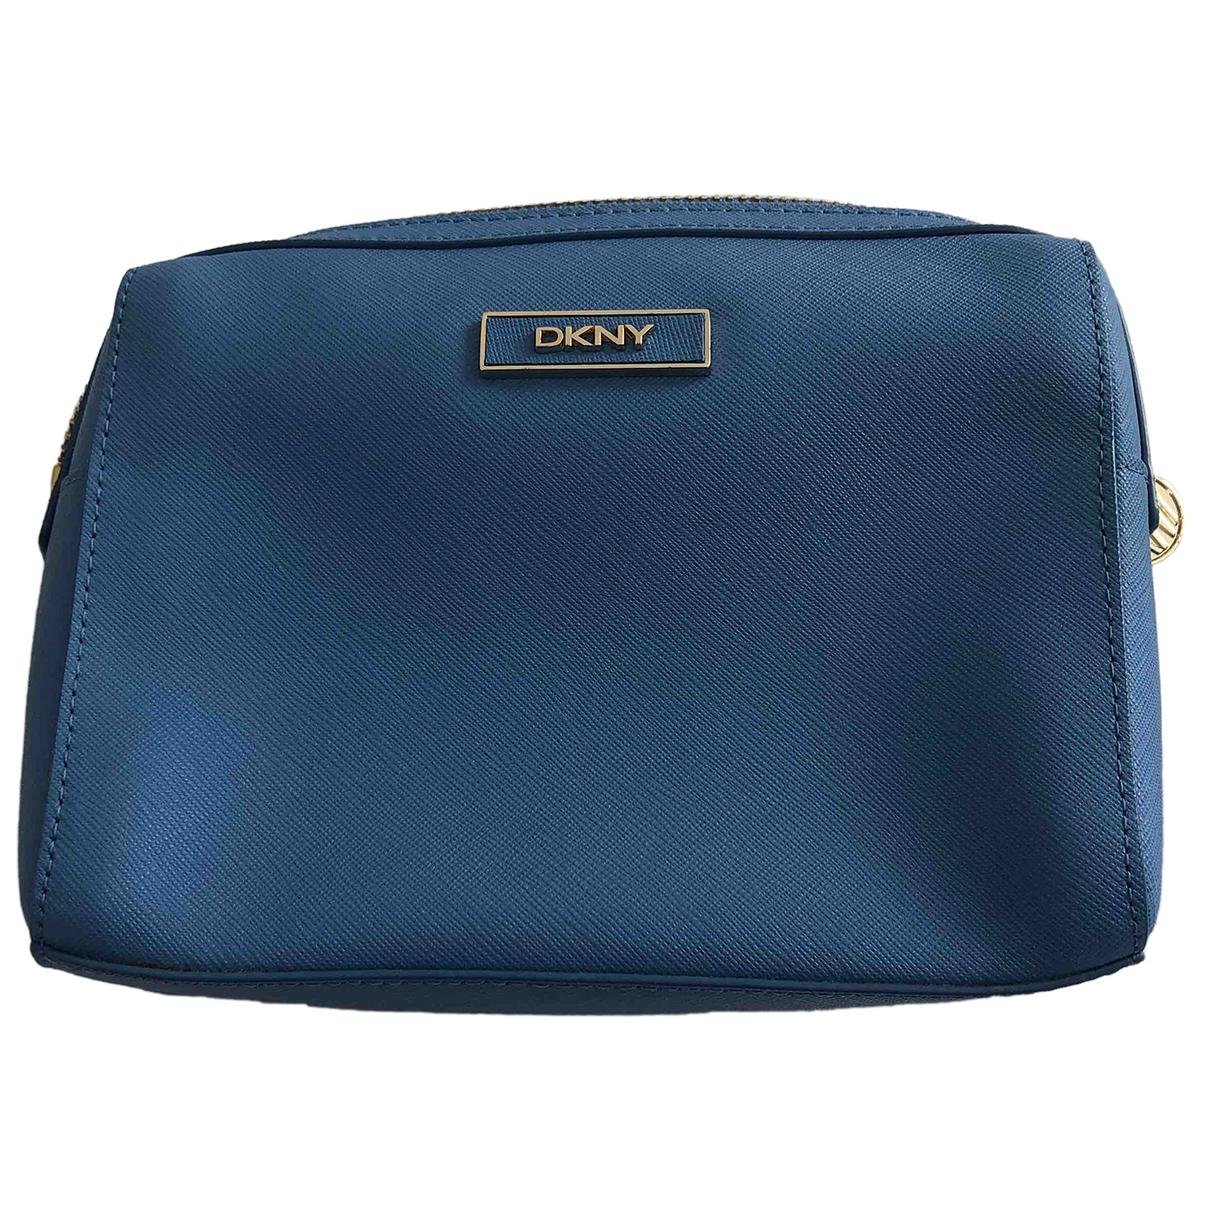 Dkny \N Blue Leather Clutch bag for Women \N